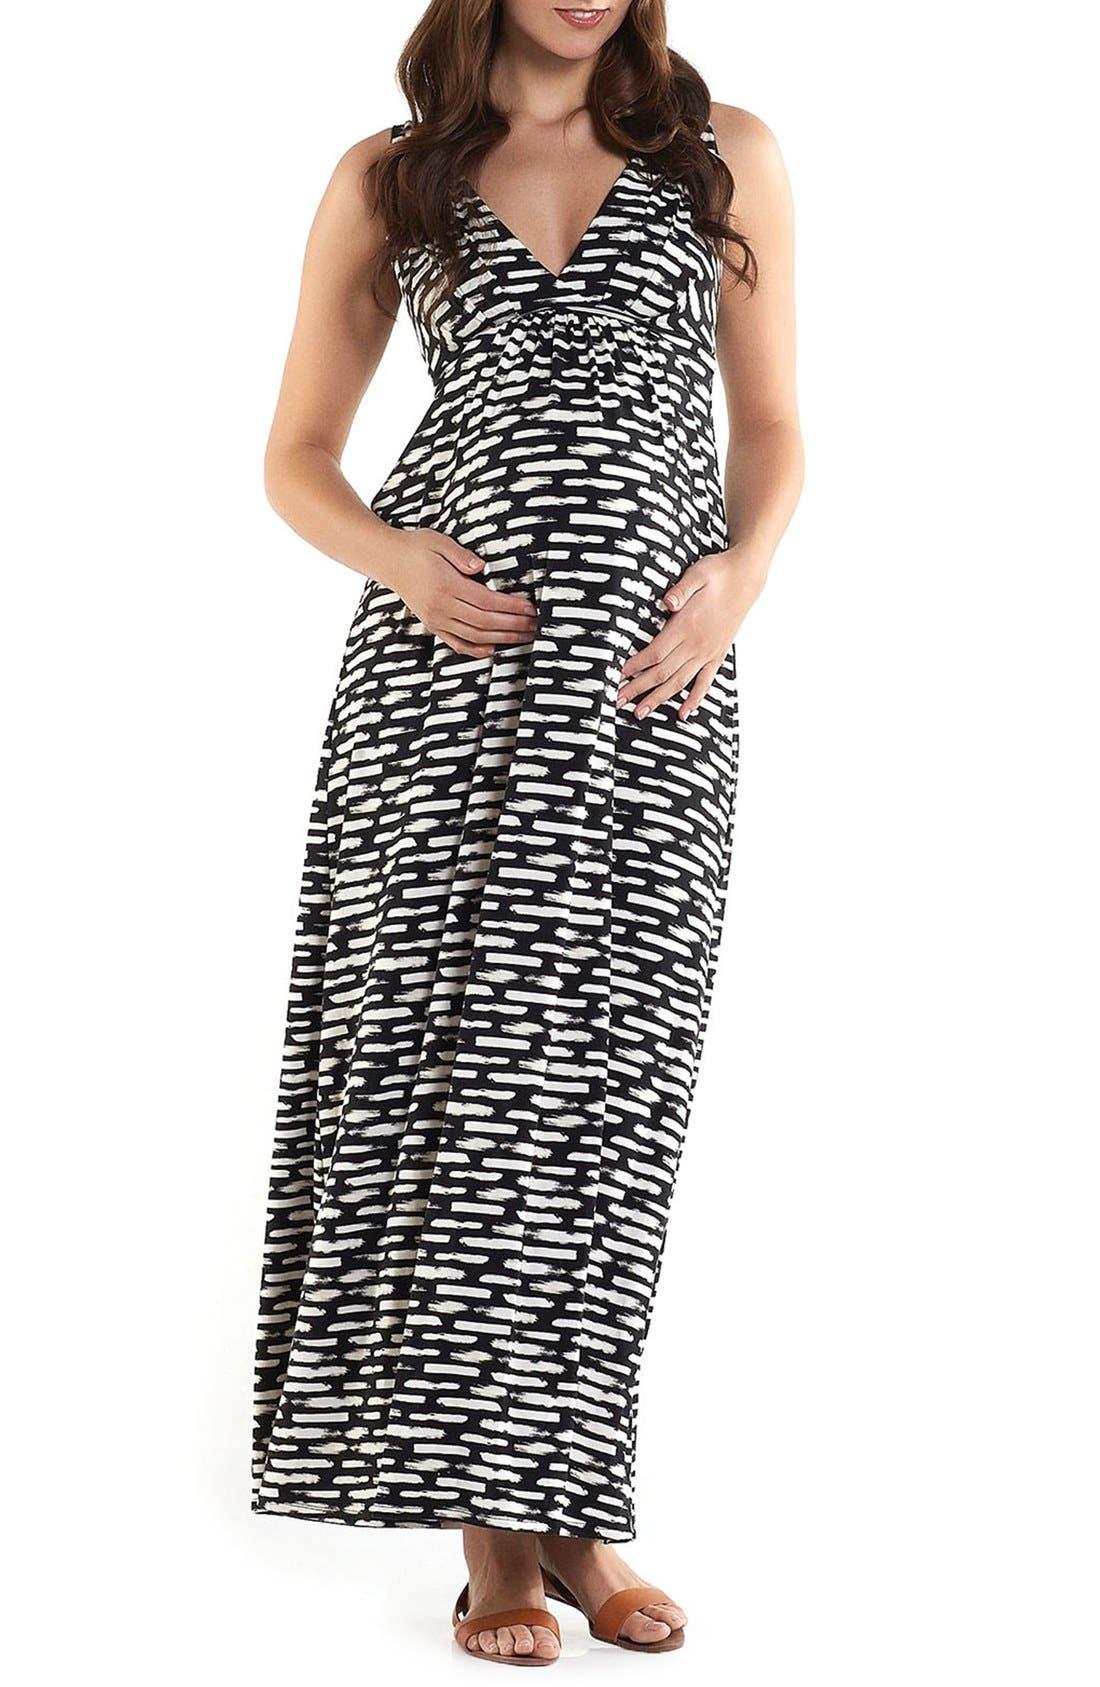 TART MATERNITY 'Chloe' Maternity Maxi Dress, Main, color, BRUSHSTROKES